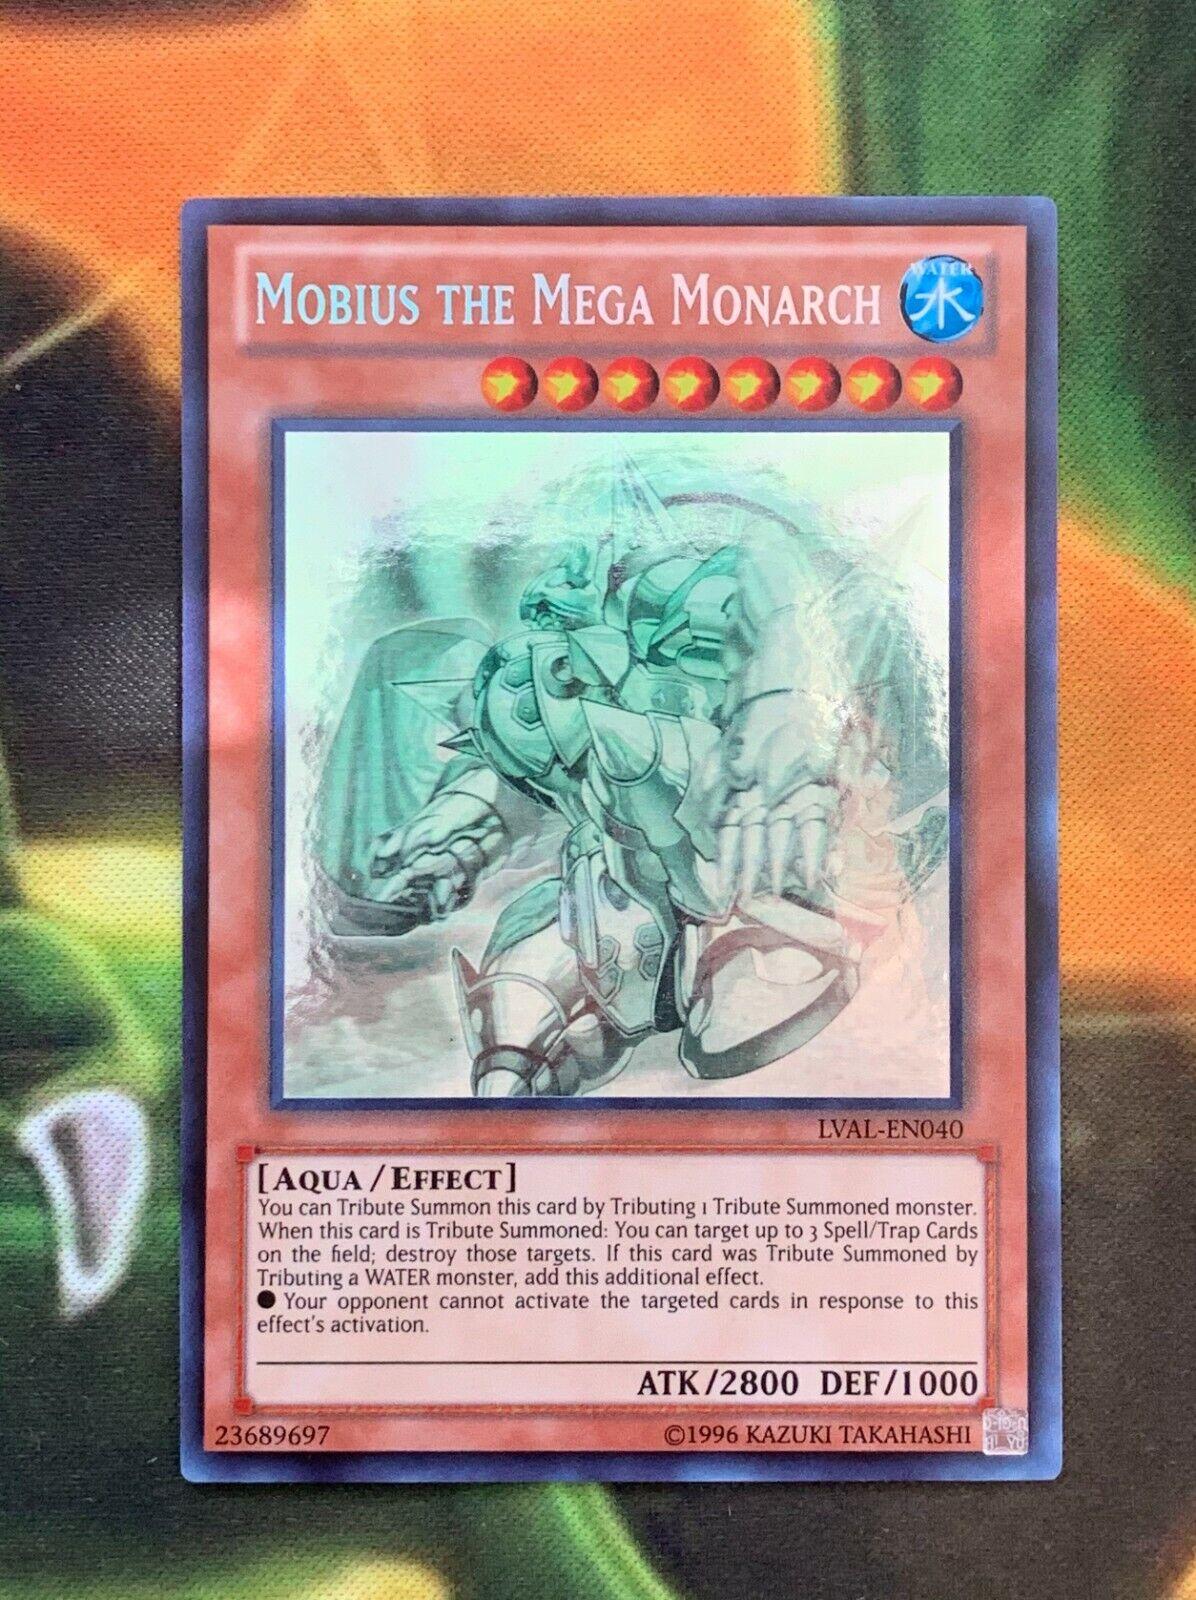 Yugioh Mobius The Mega Monarch LVAL-EN040 Ghost Rare Mint  - $42.95